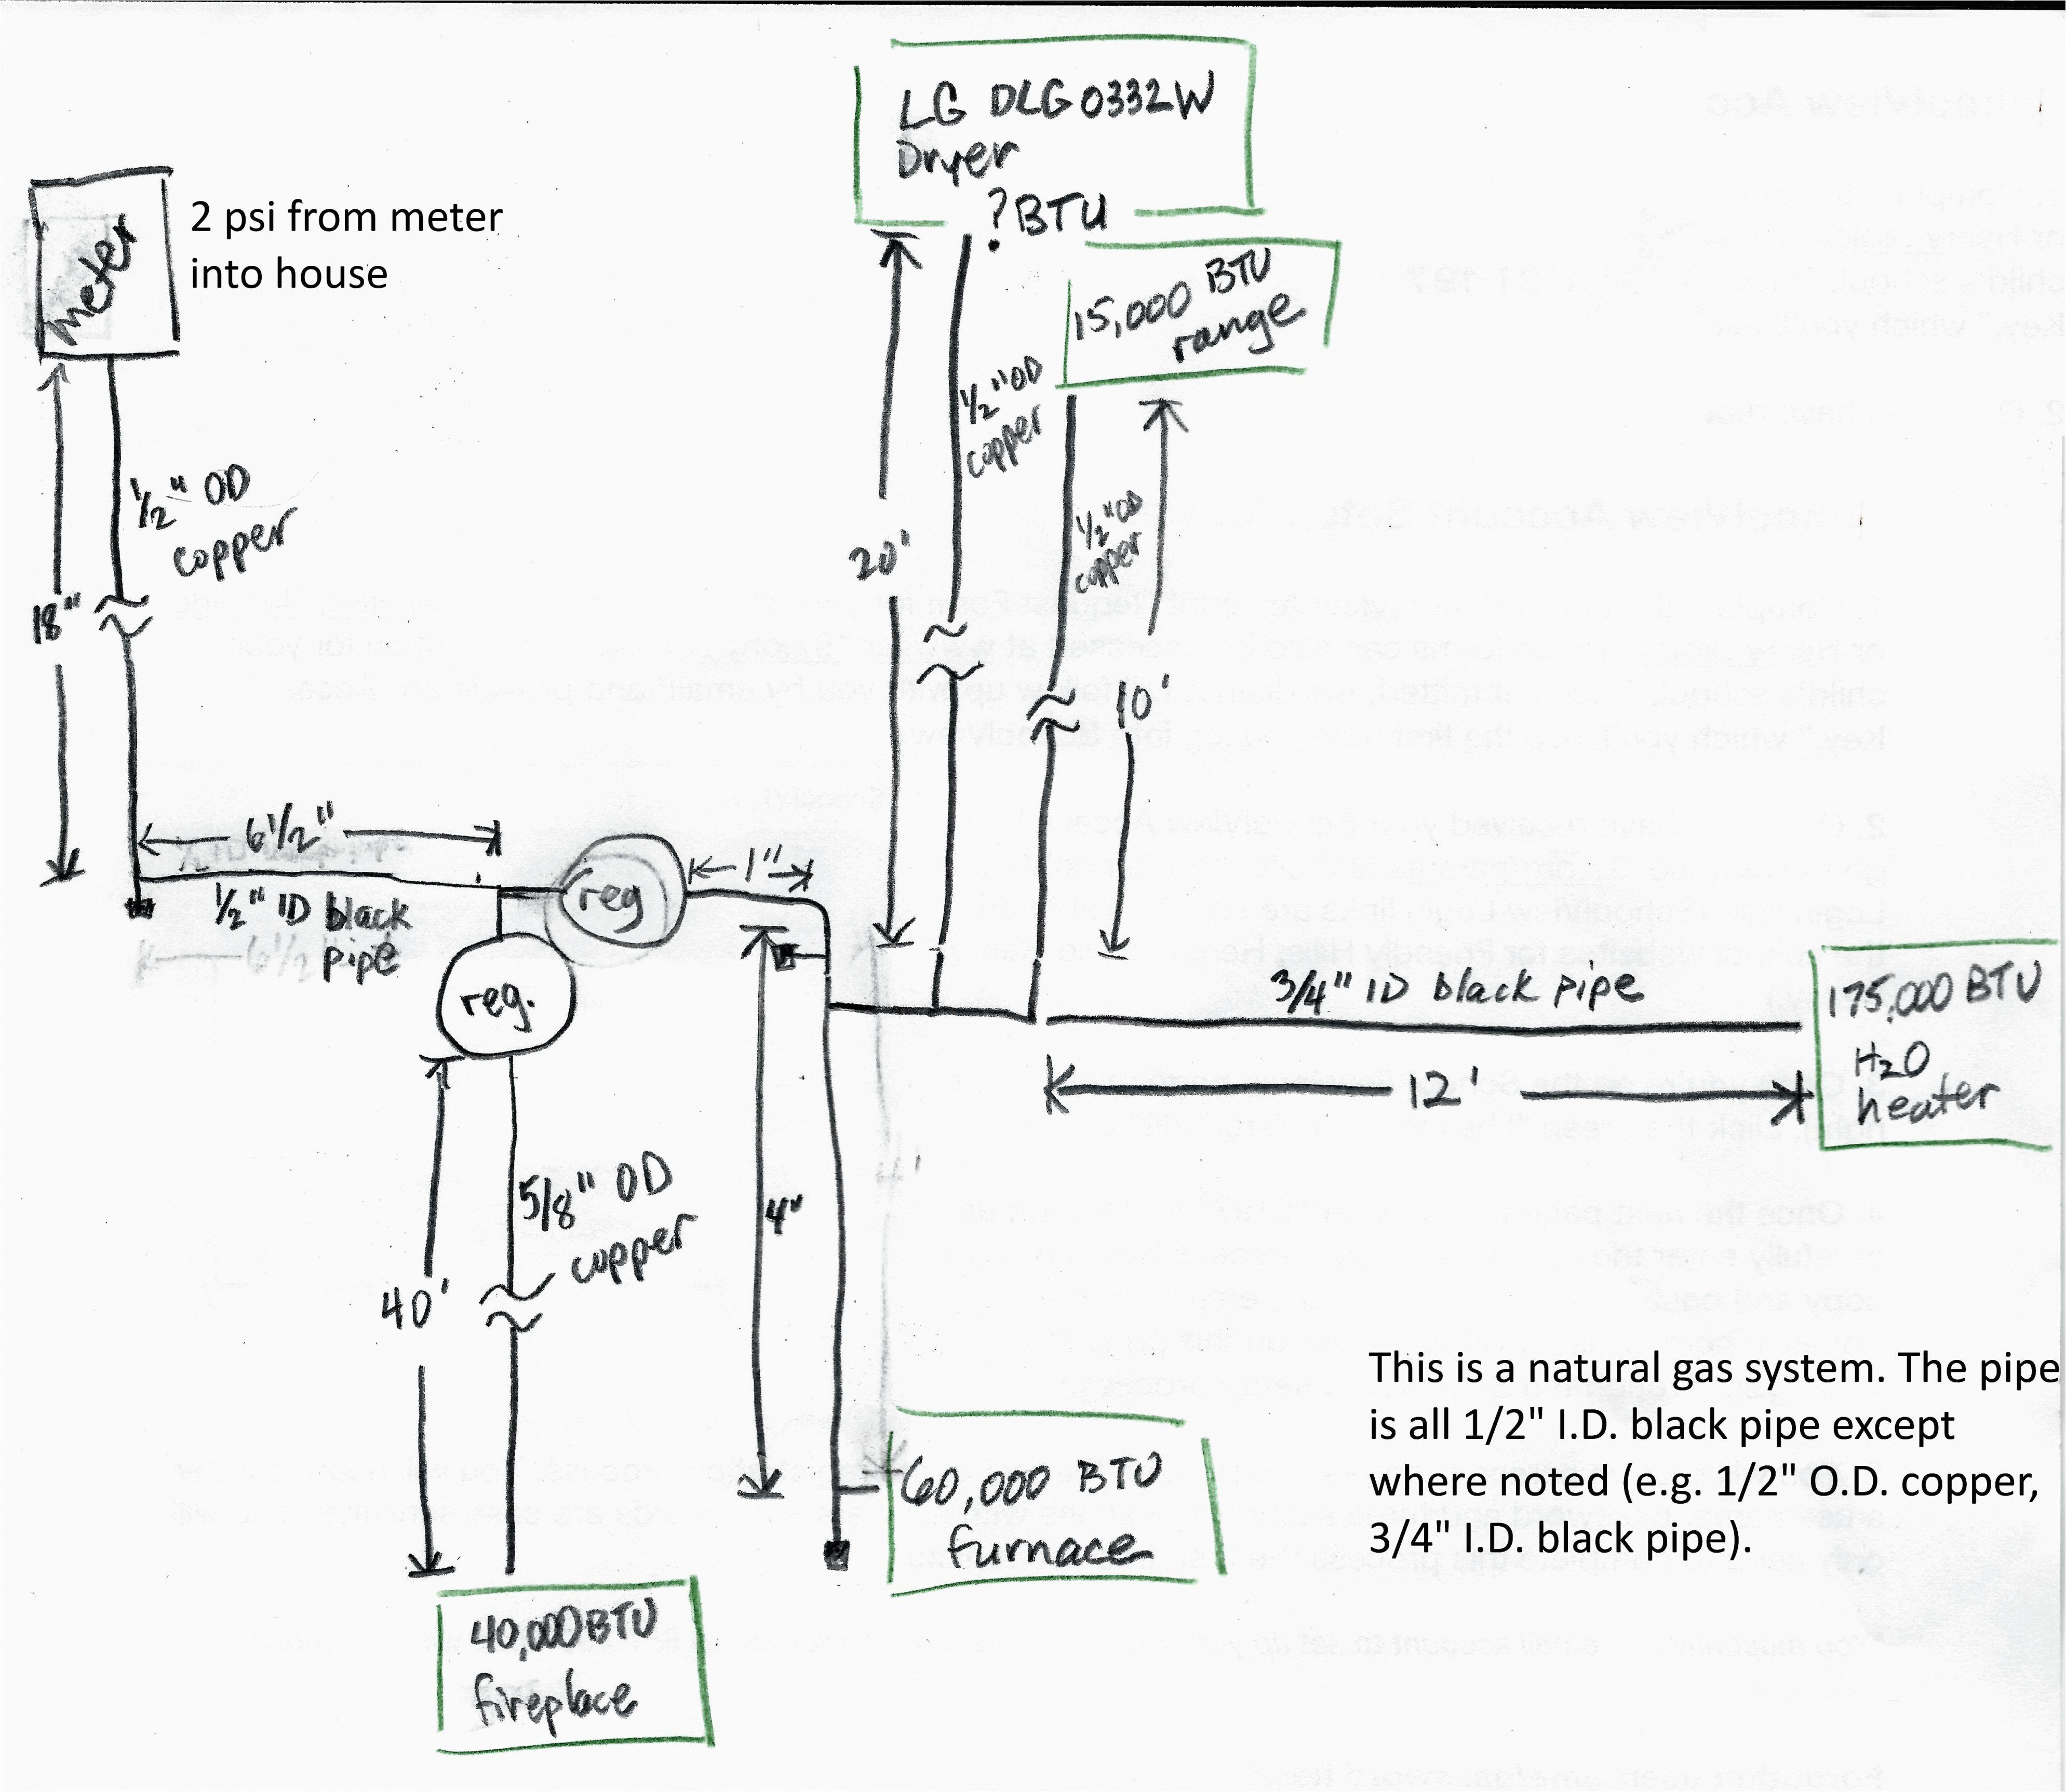 radiant heat thermostat wiring diagram free download data wiring radiant heat thermostat wiring diagram free download